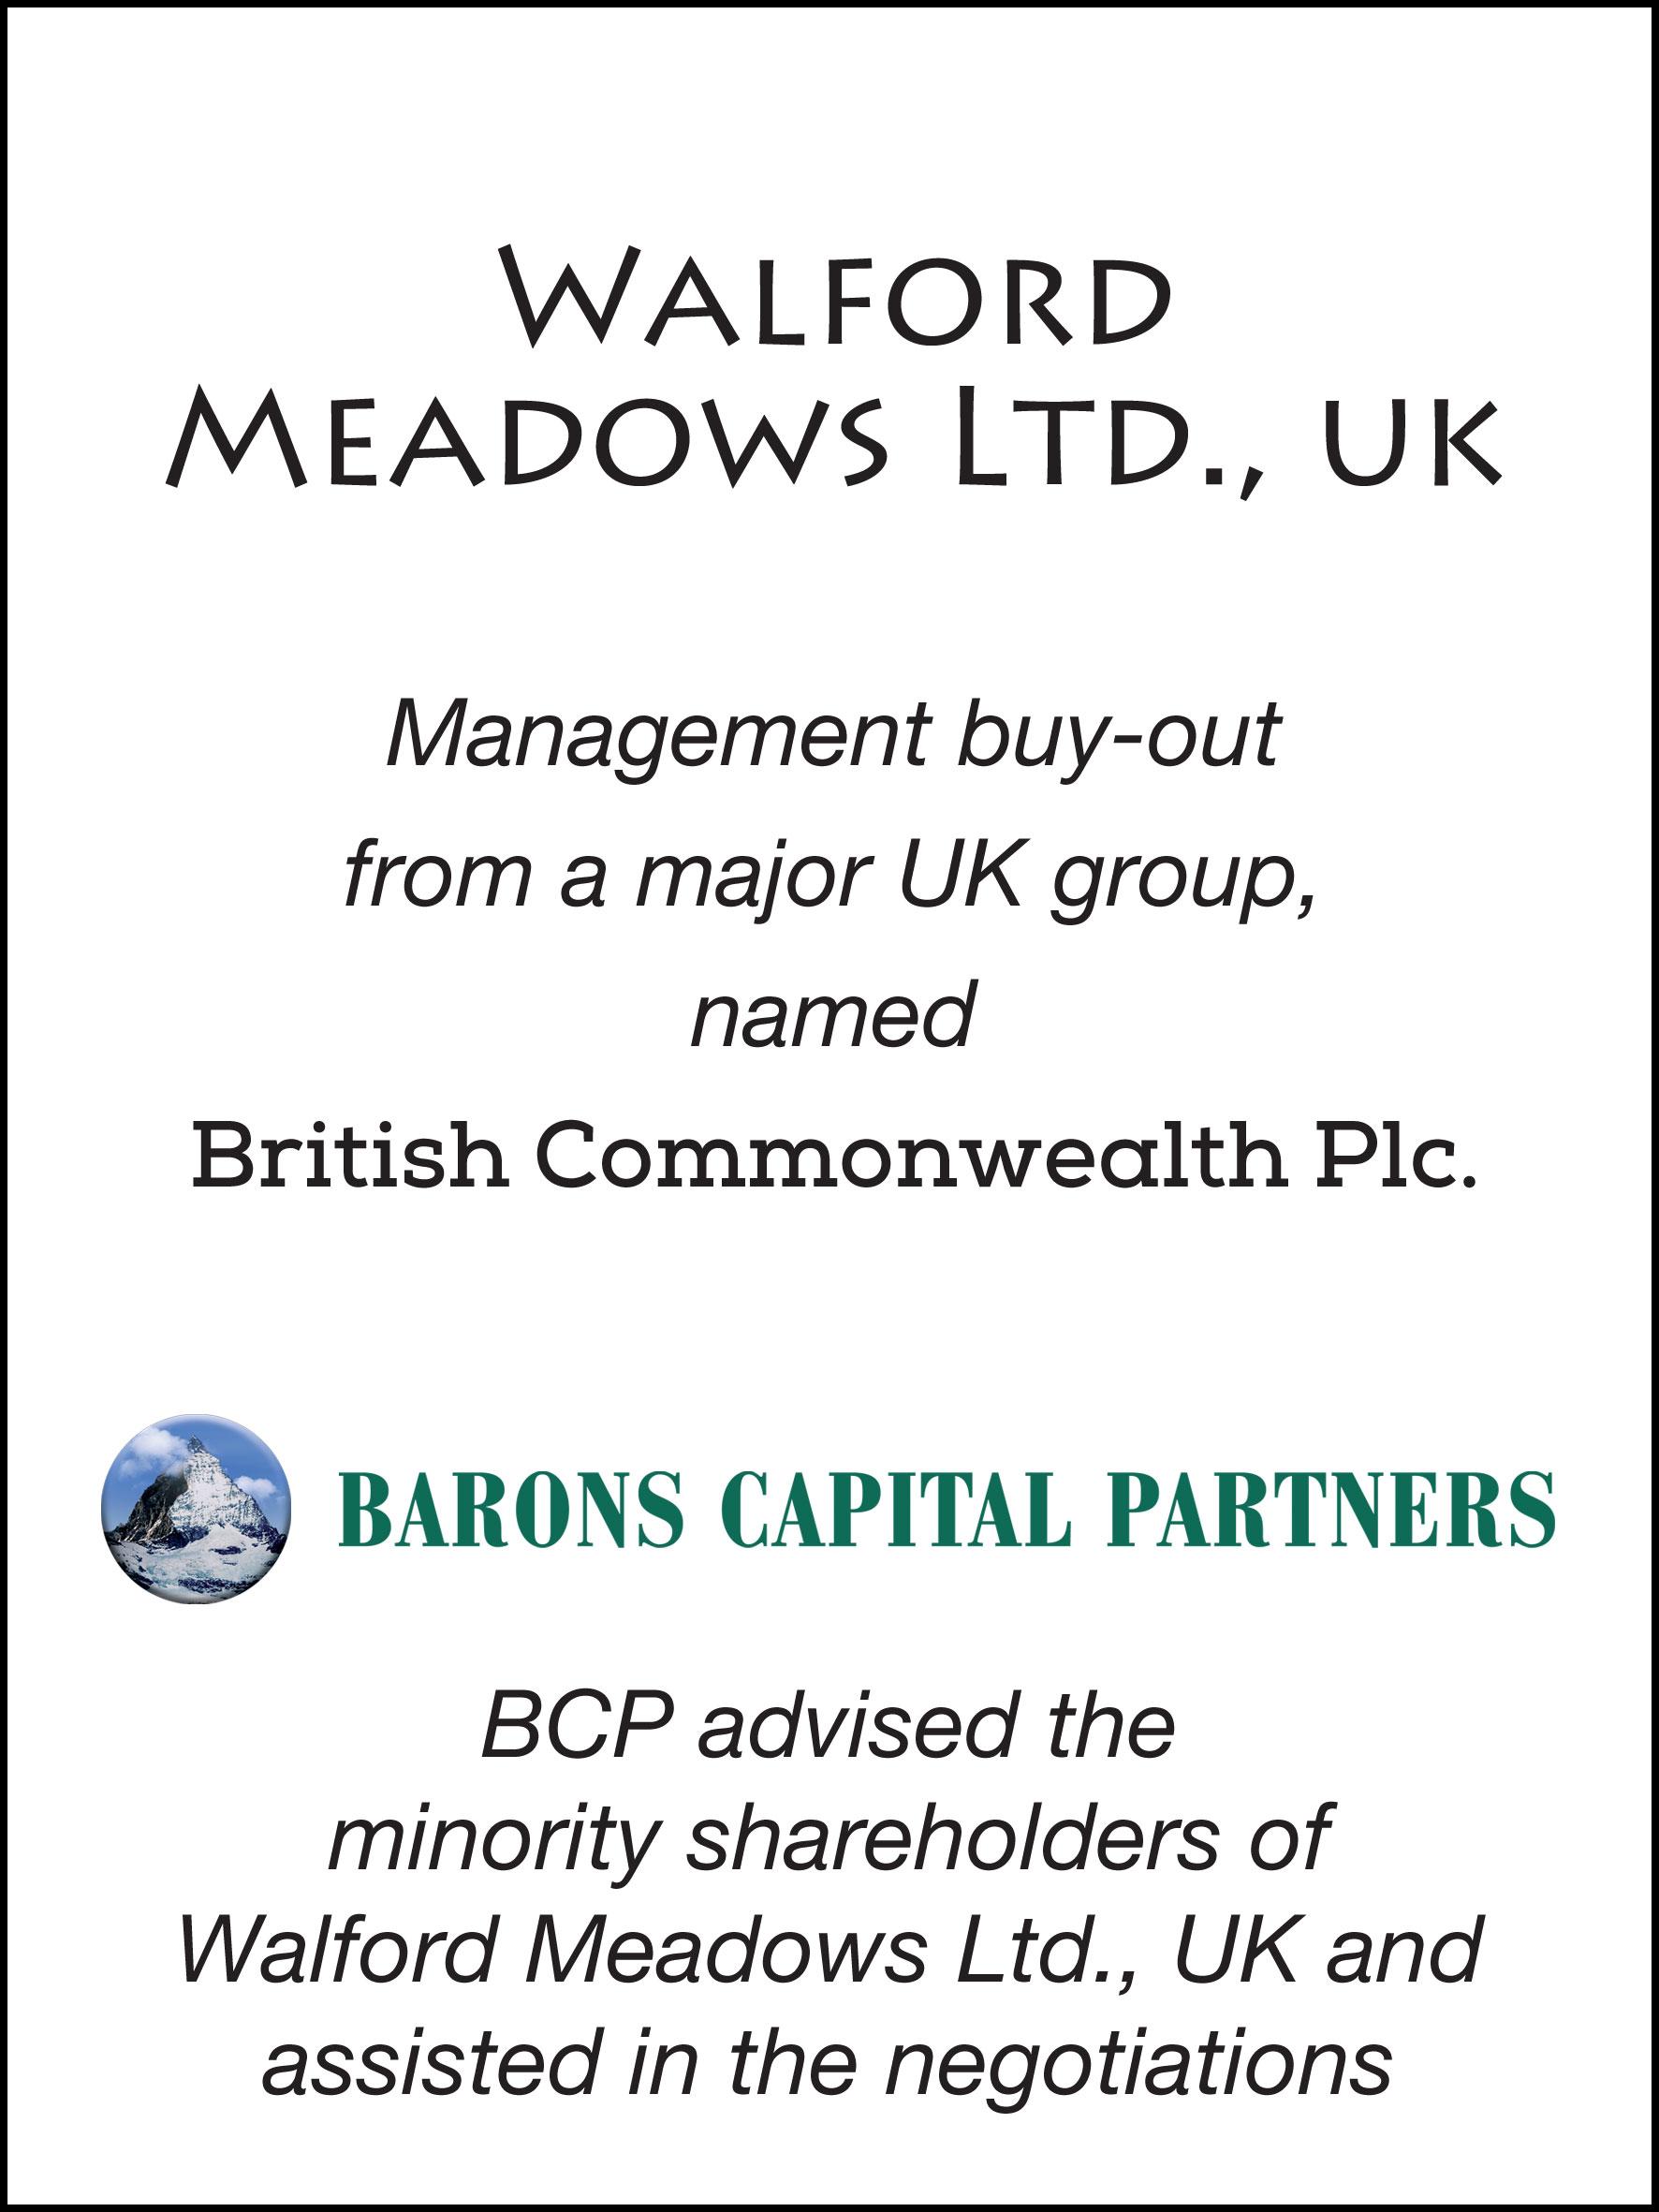 36_Walford Meadows Ltd